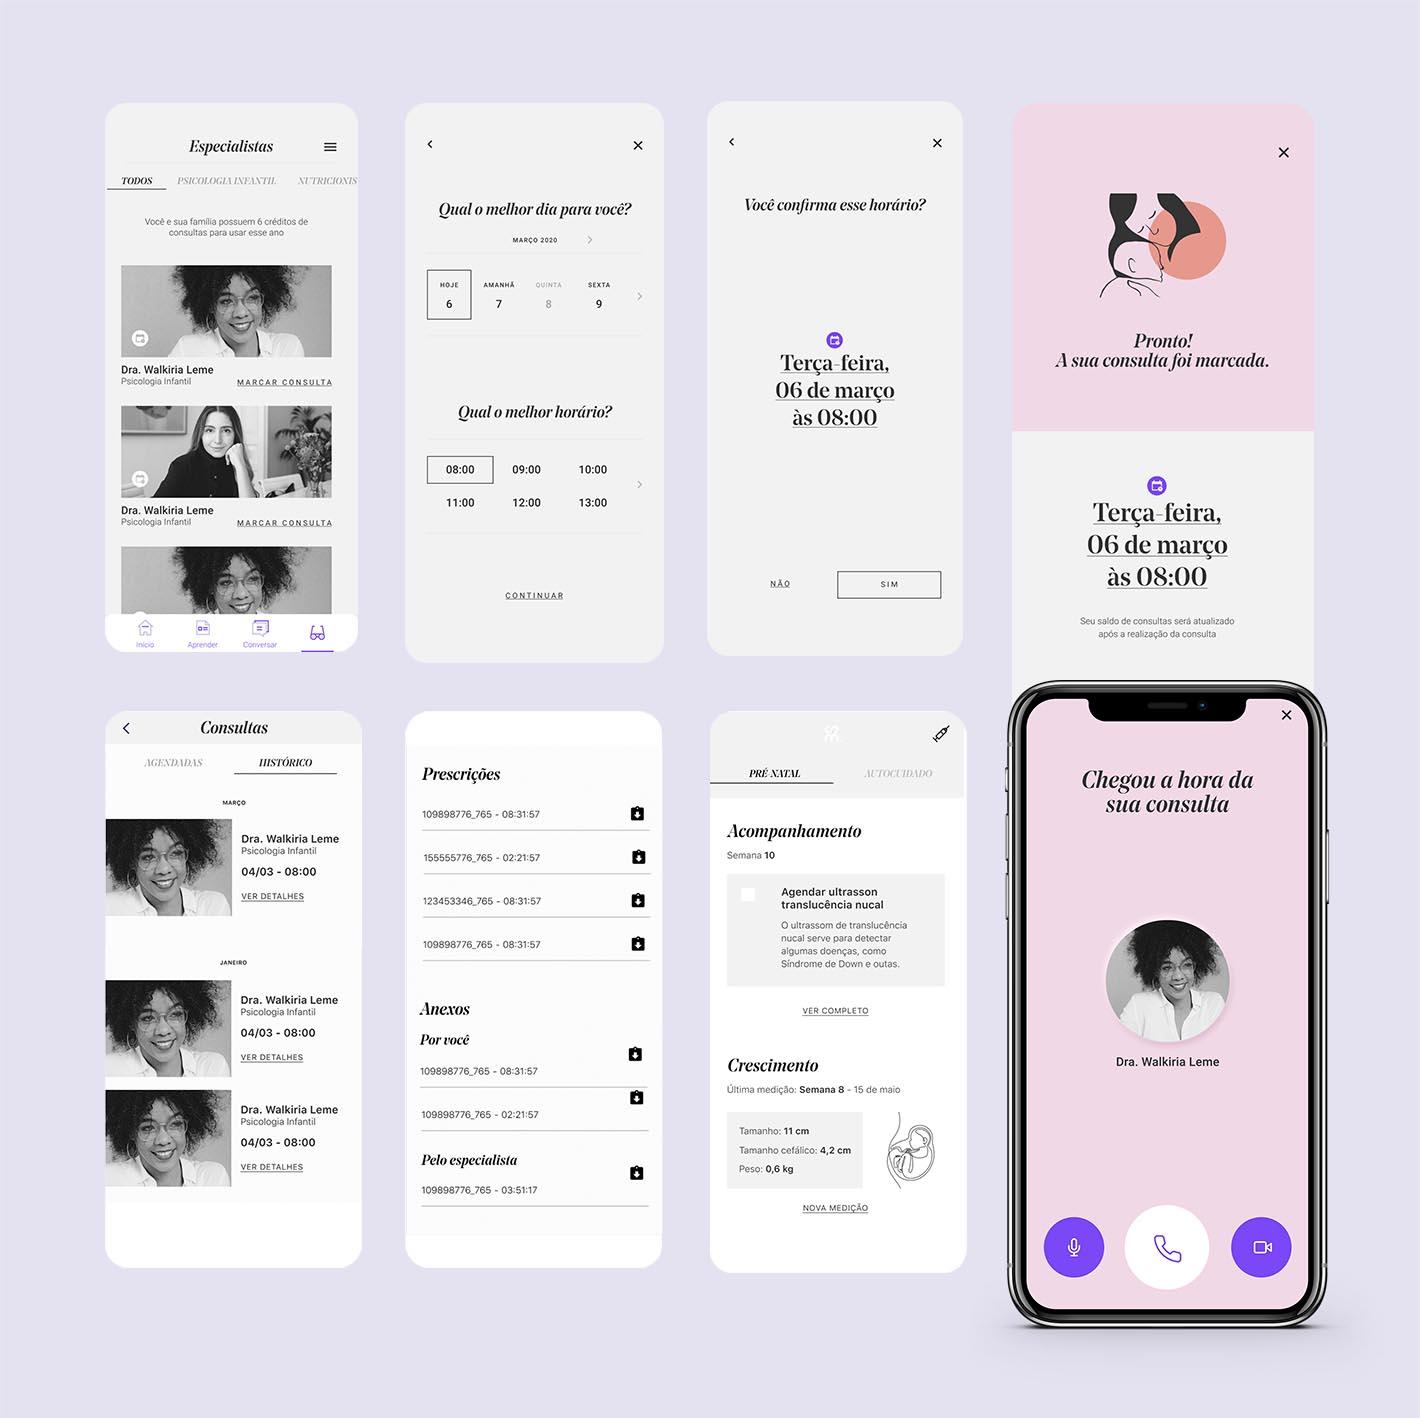 bloom-app-familia-empresas